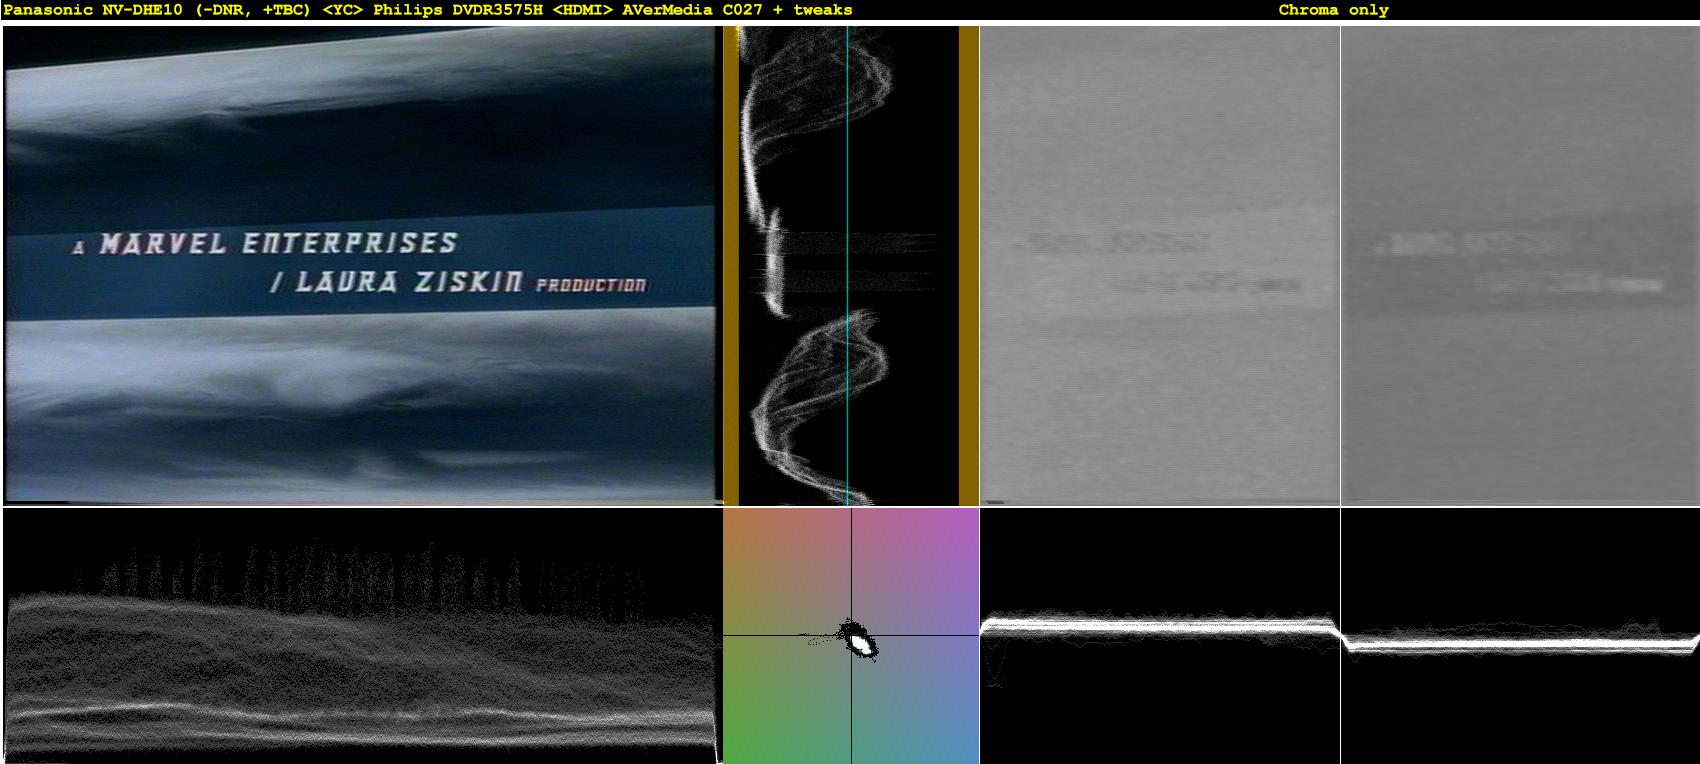 Click image for larger version  Name:0-09-01 - Panasonic NV-DHE10 (-DNR, +TBC).png Views:1147 Size:947.2 KB ID:37992